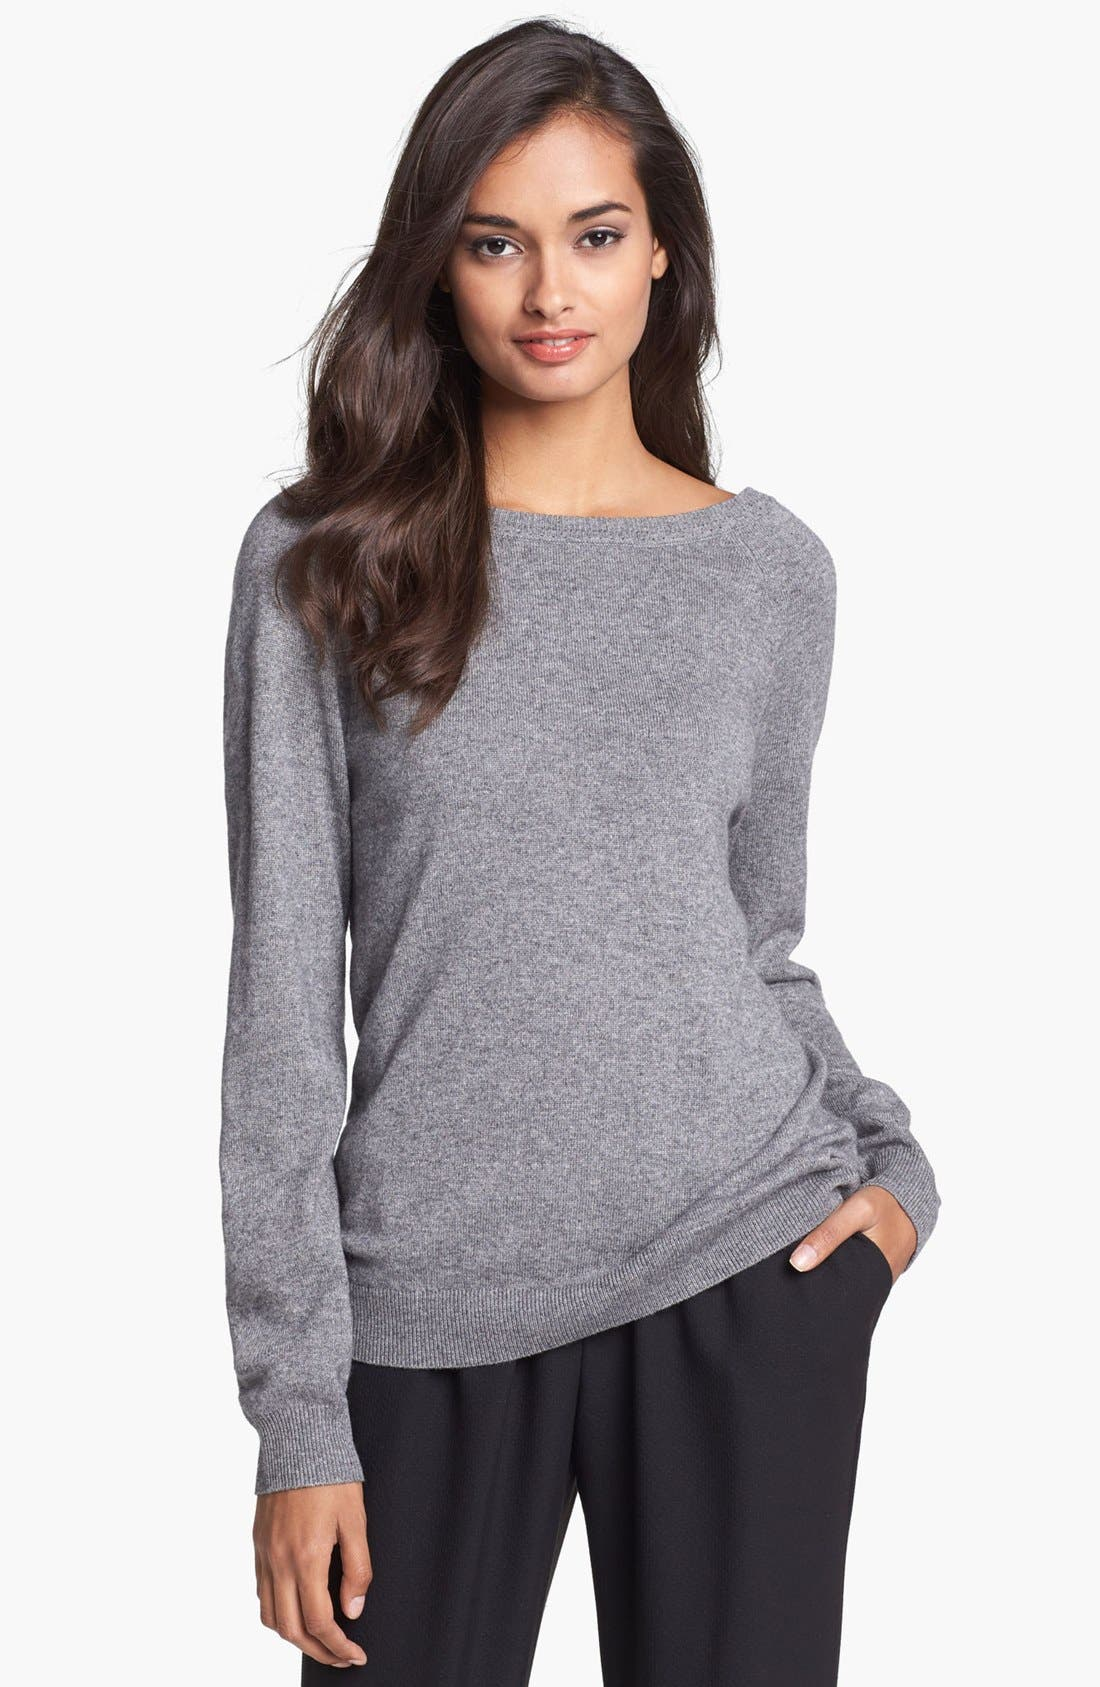 Alternate Image 1 Selected - Trina Turk 'Maelie' Silk & Cashmere Sweater